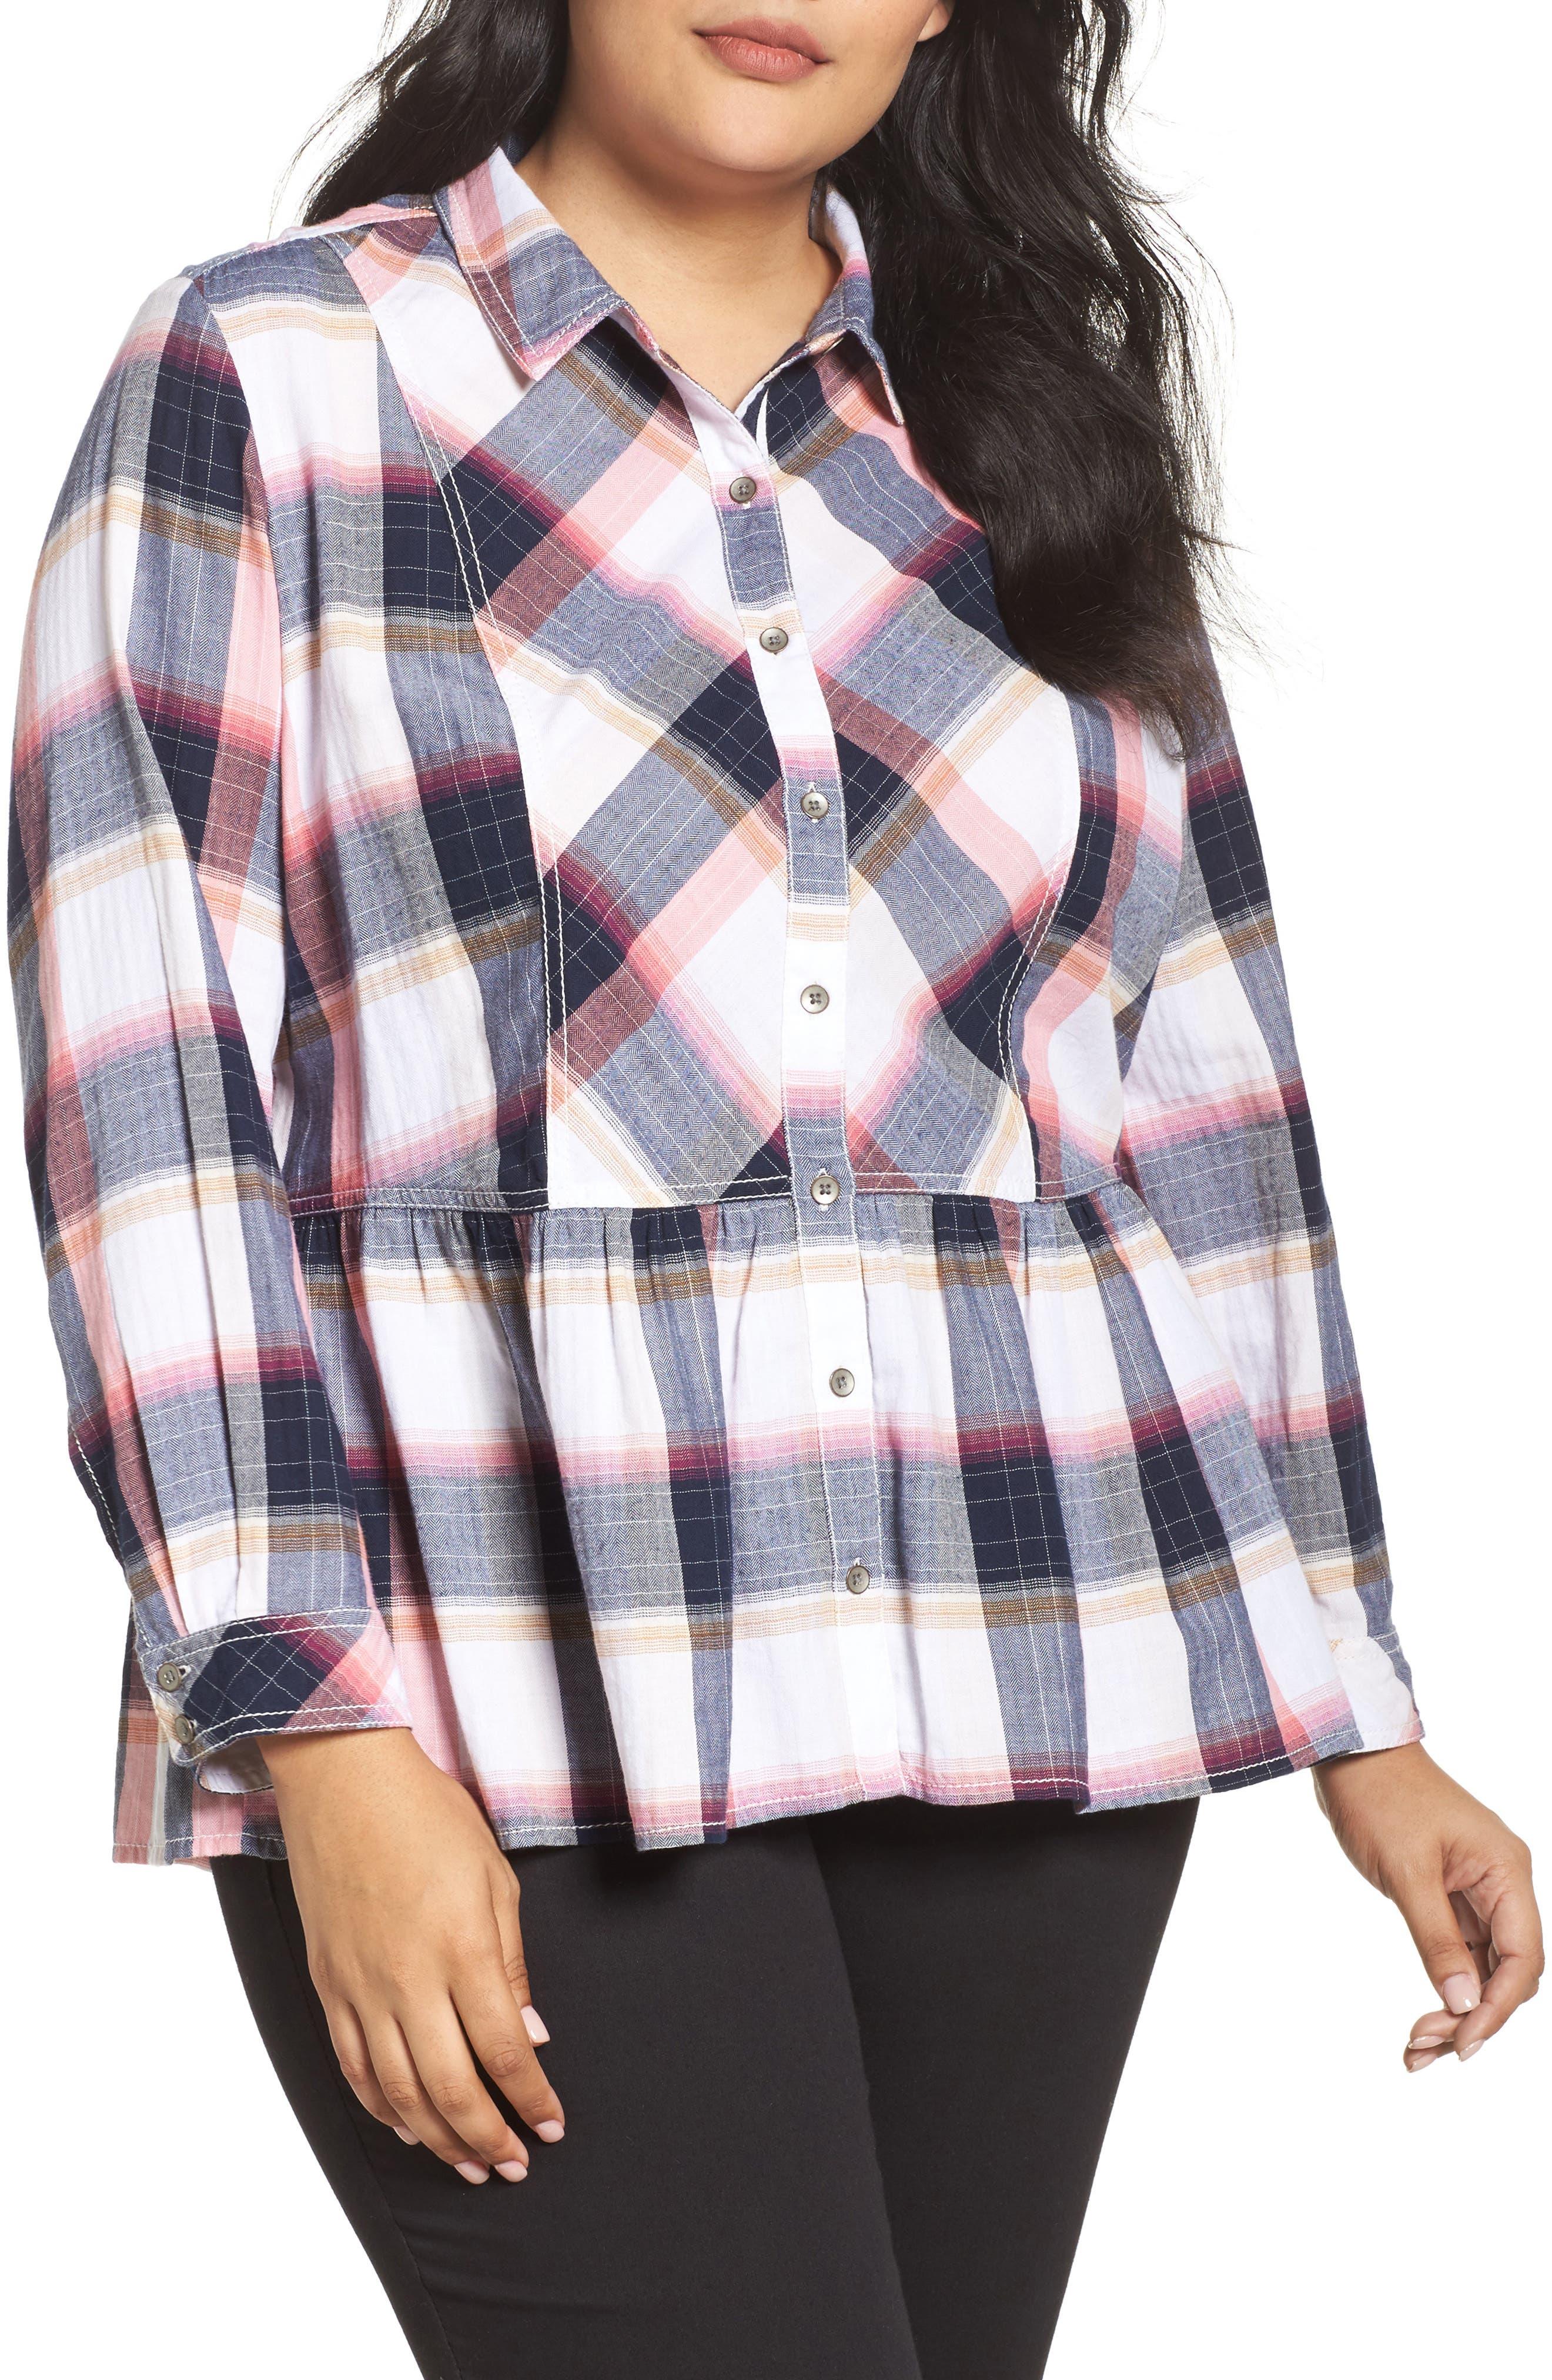 Alternate Image 1 Selected - Caslon® Plaid Peplum Shirt (Plus Size)